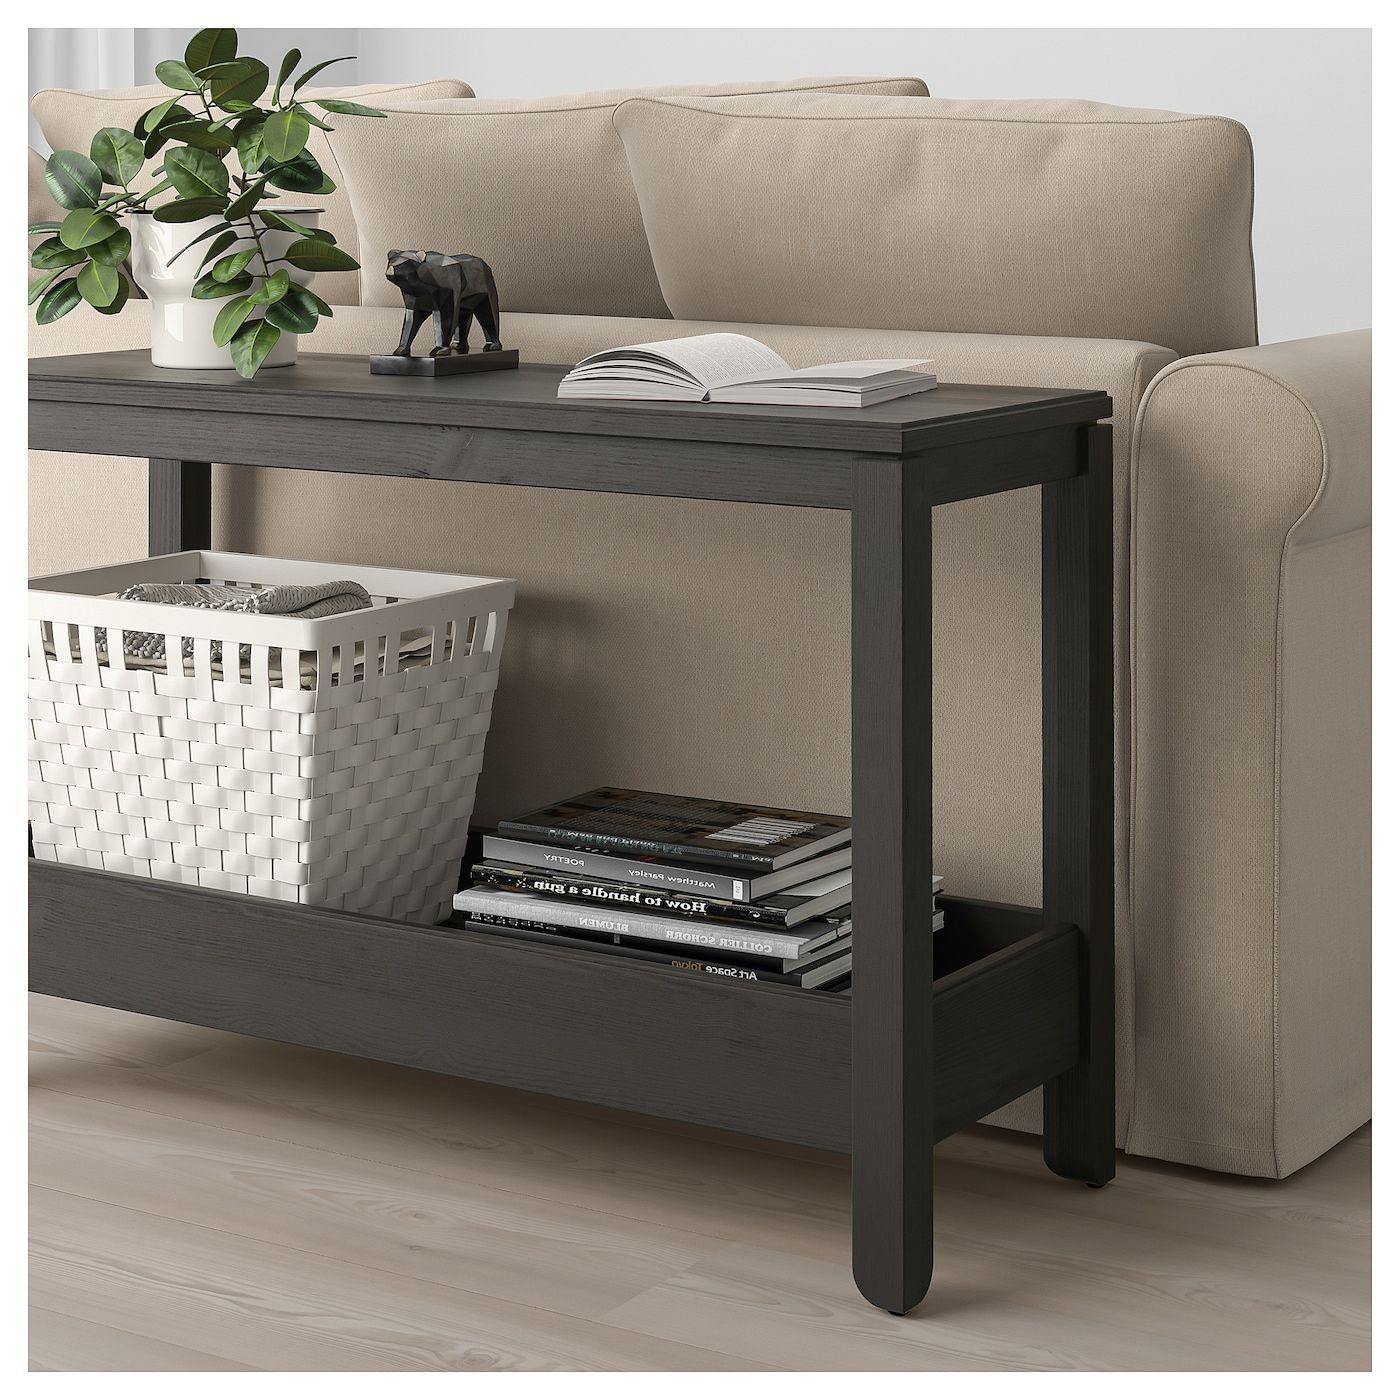 Havsta Avlastningsbord Mork Brun Ikea Ikea Console Table Console Table Ikea